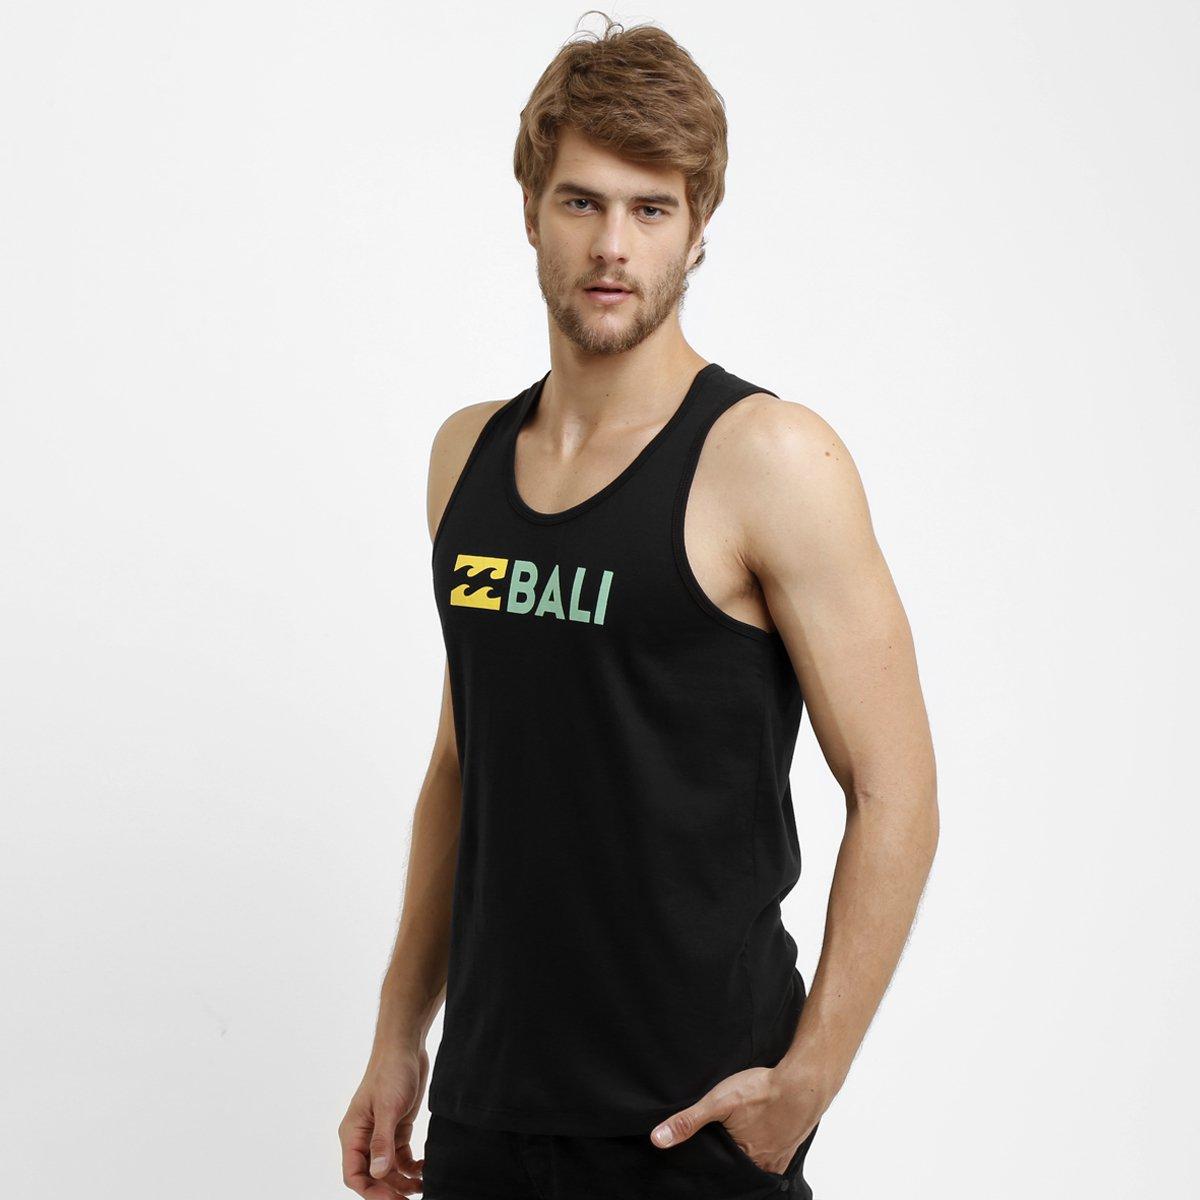 Camiseta Regata Billabong Destination - Compre Agora  d82045f1a71